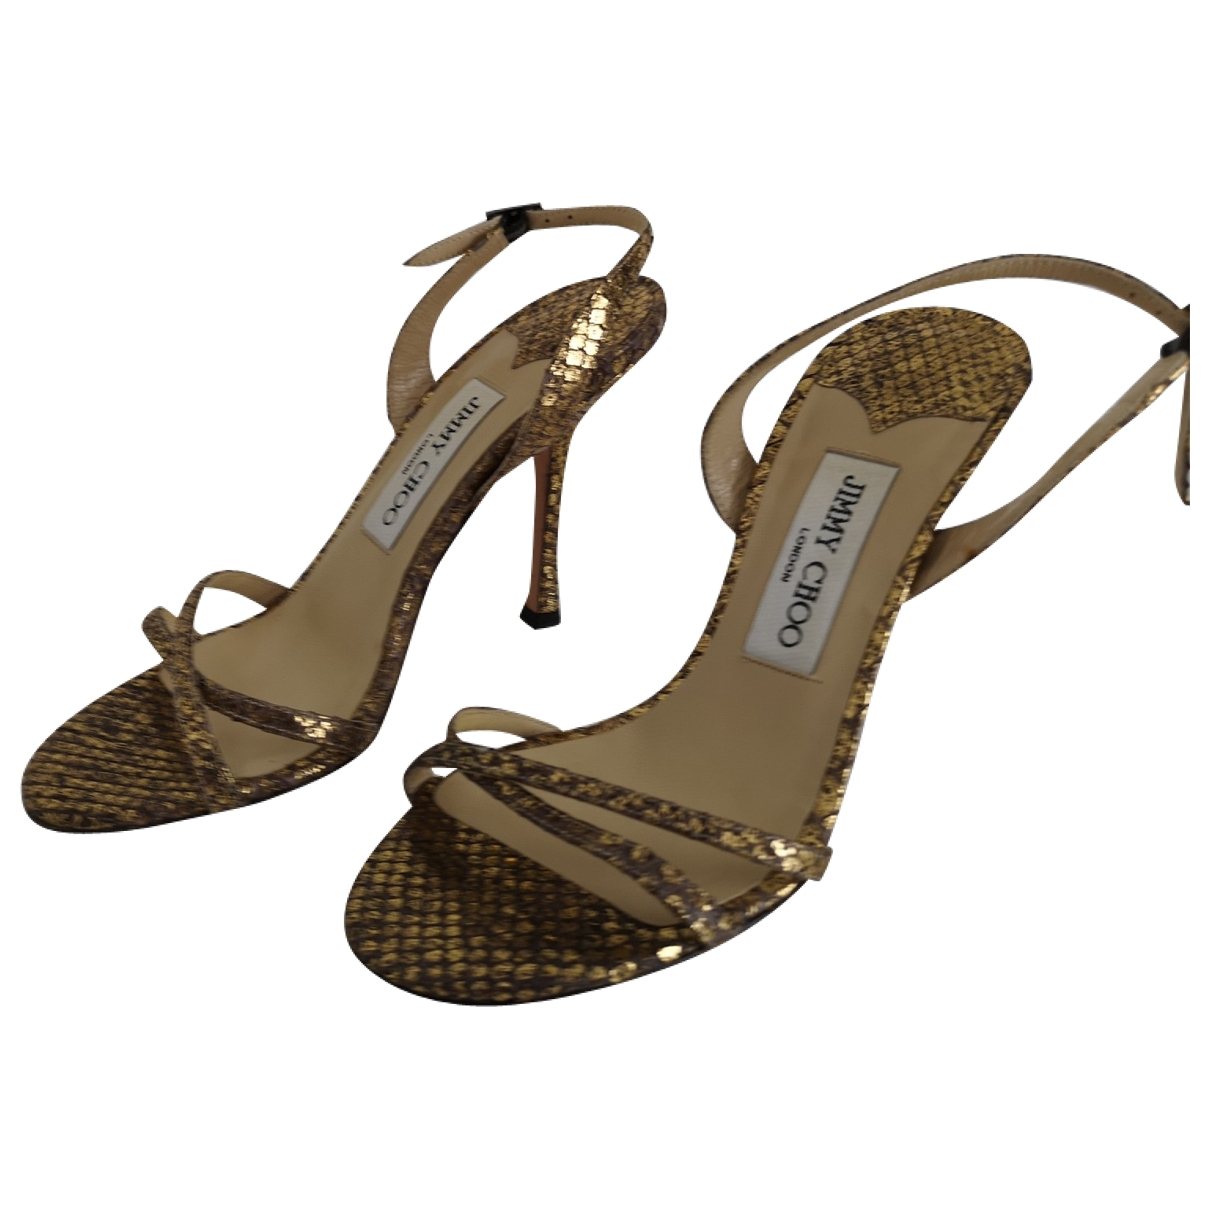 Sandalias de Piton Jimmy Choo